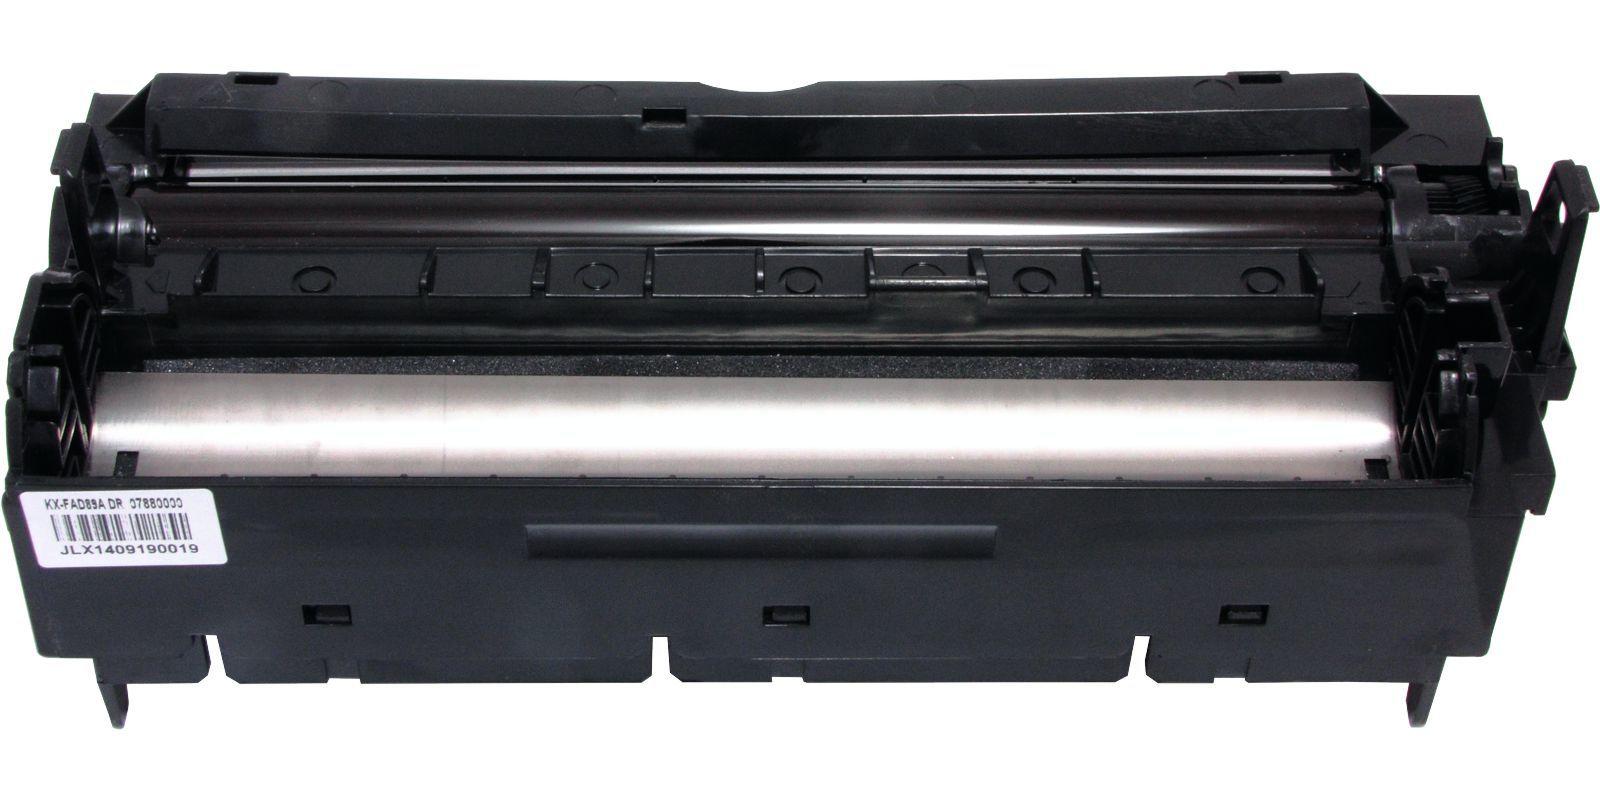 MAK KX-FAD89A, черный, для Panasonic, DRUM Unit, до 10000 стр.